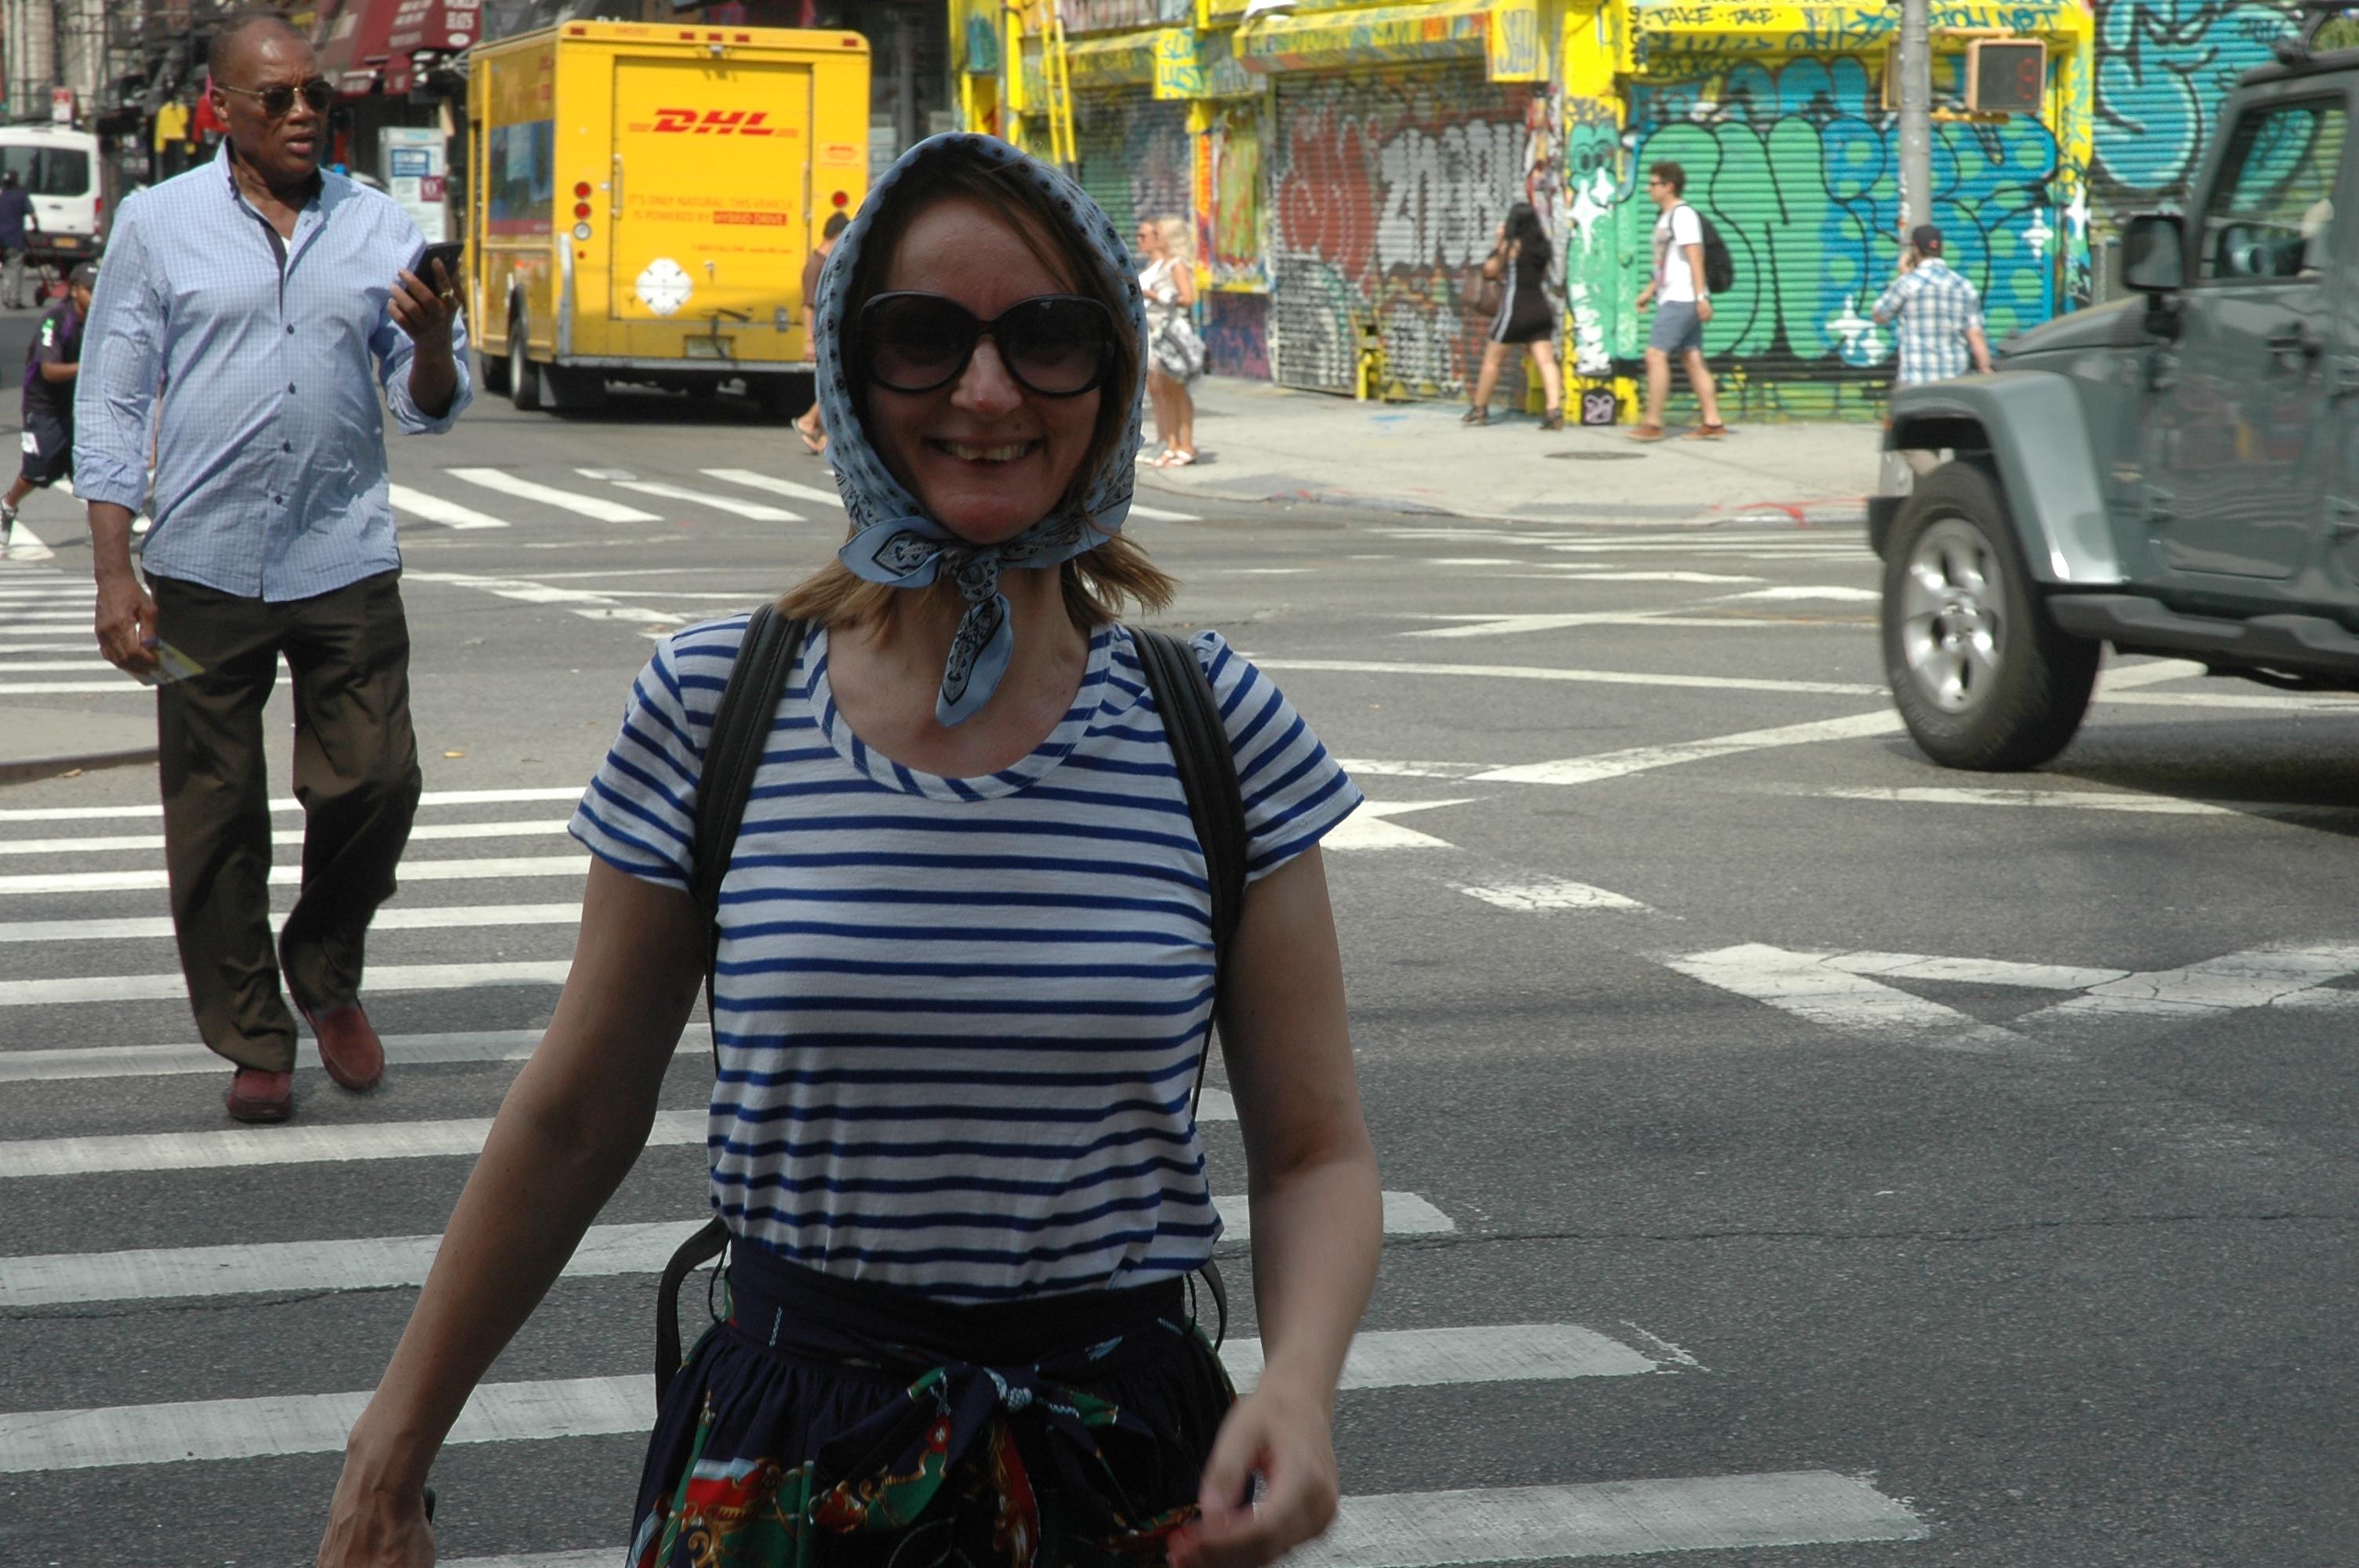 New_York_zurechtfinden_tipps-oceanblue-style-reise-blog.jpg